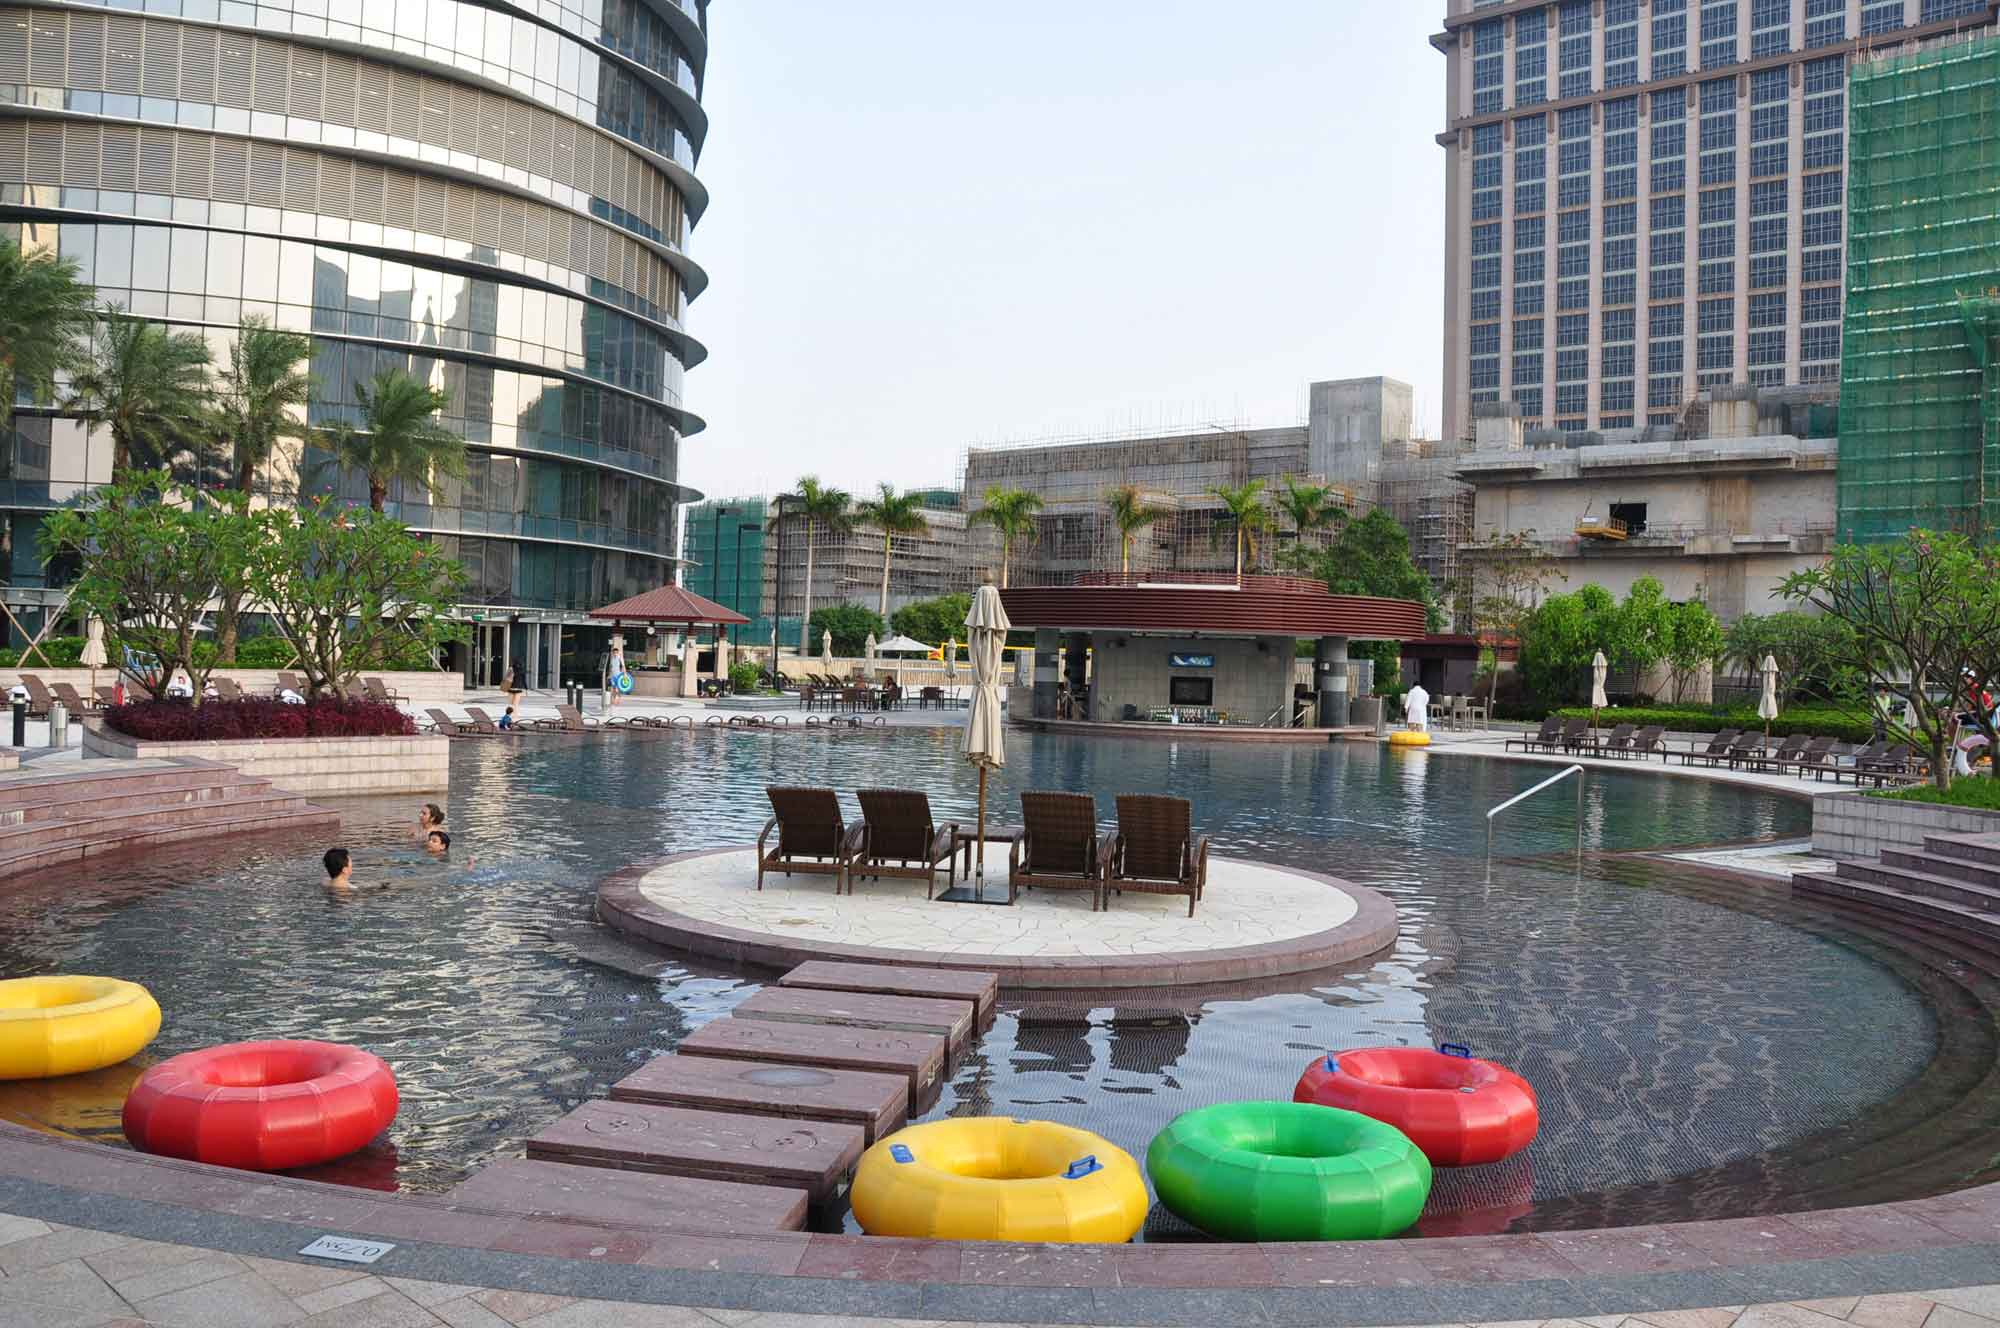 Hard Rock outdoor pool